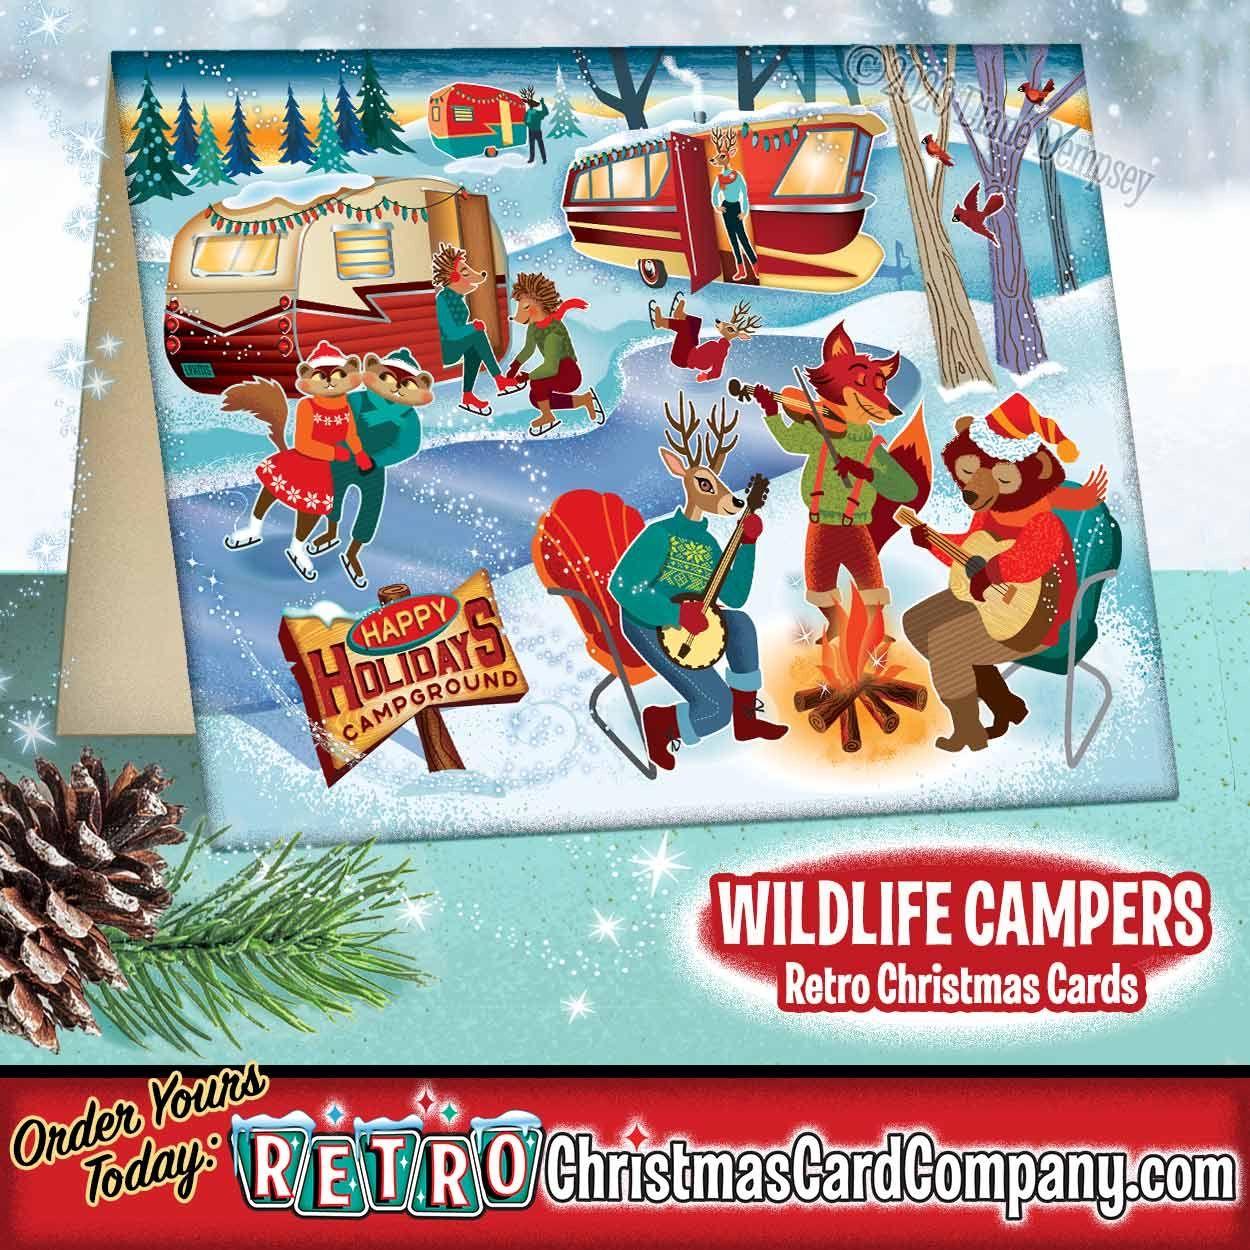 Wildlife Christmas Cards 2020 Wildlife Campers Retro Christmas Cards in 2020 | Retro christmas